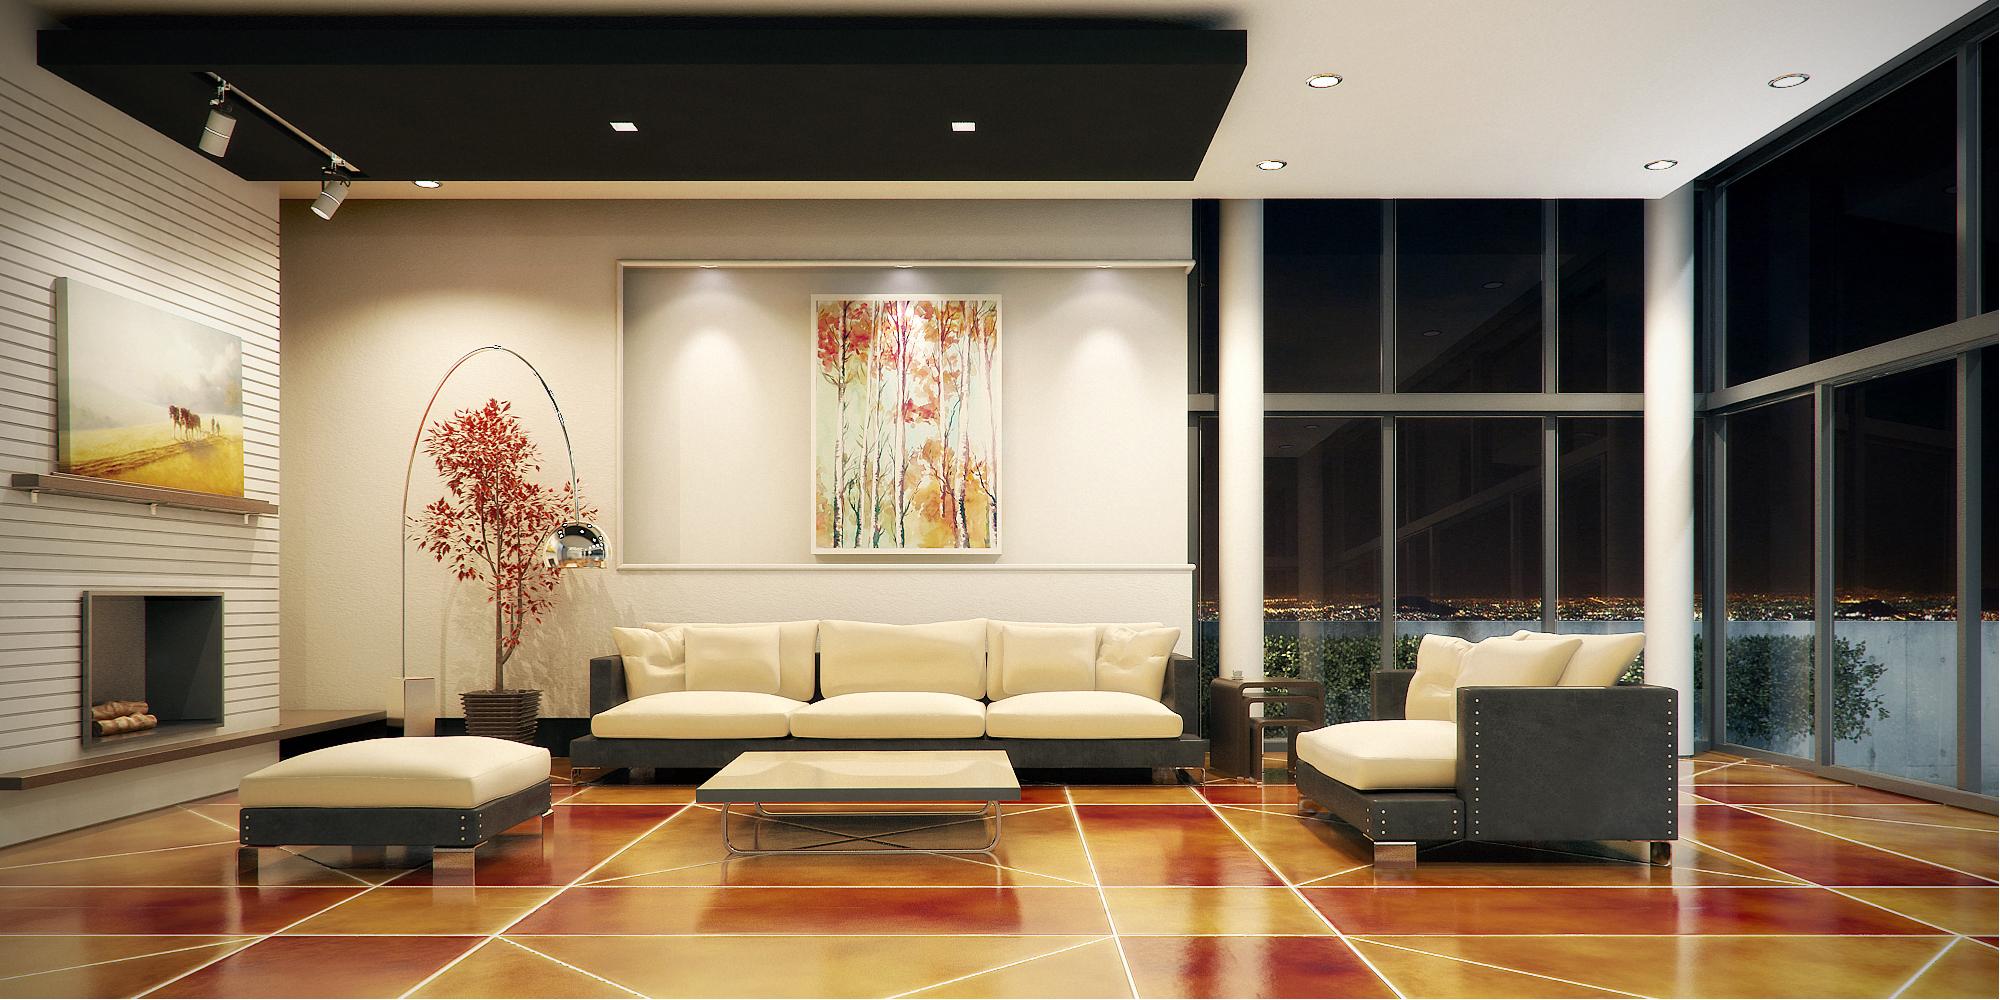 Фото 3 д дизайн квартиры